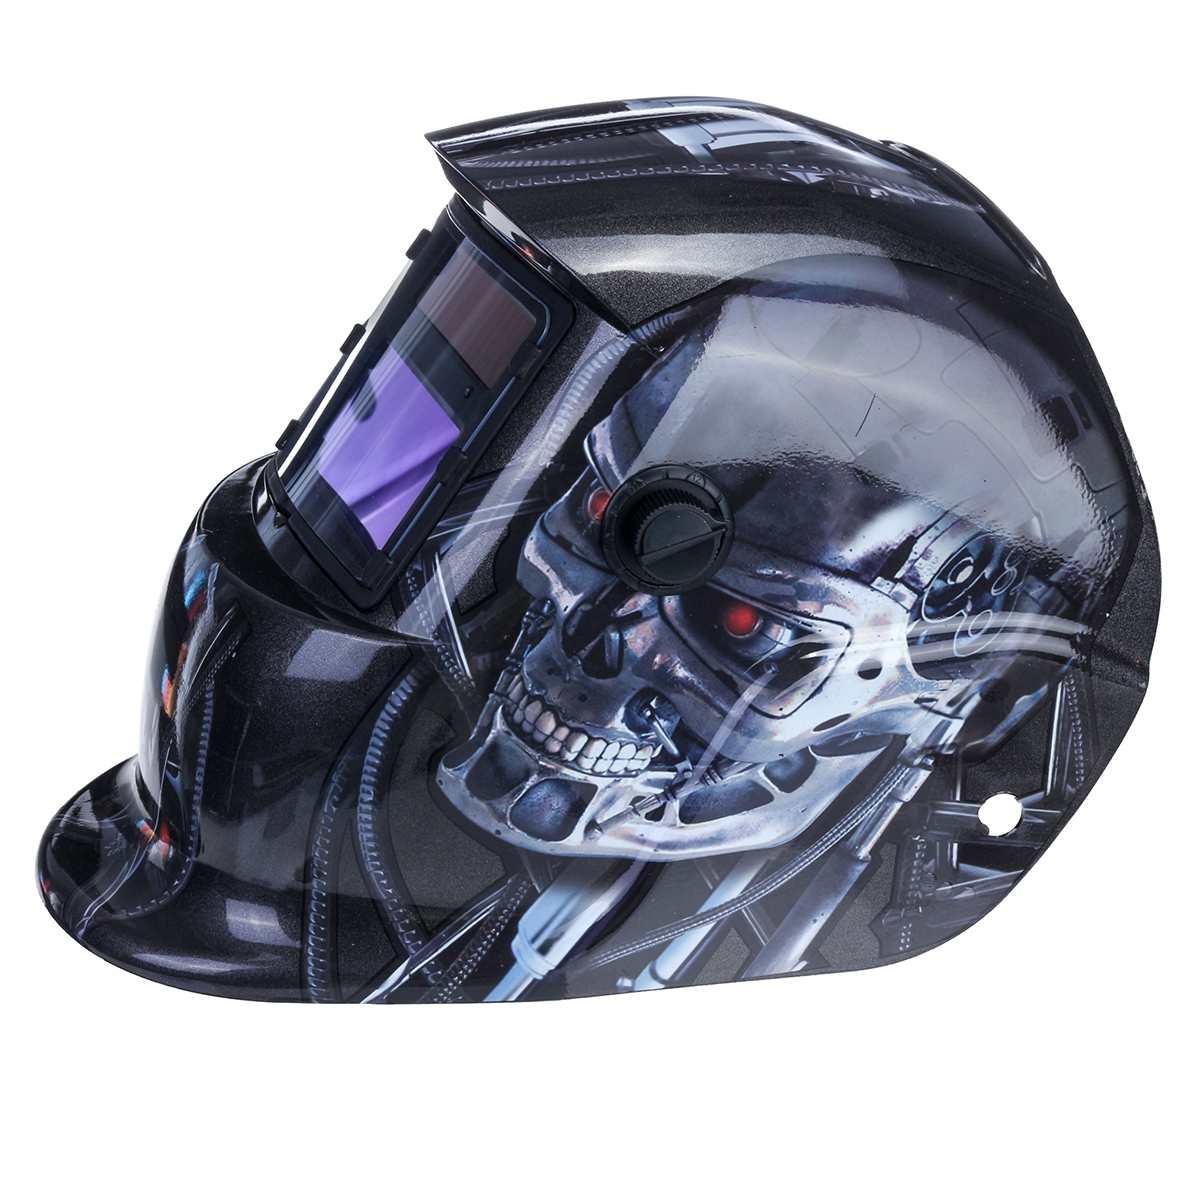 Automatic Welding Helmet Mask Helmet Electric Welding Auto Darkening Welding TIG MIG Welding Lens Mask